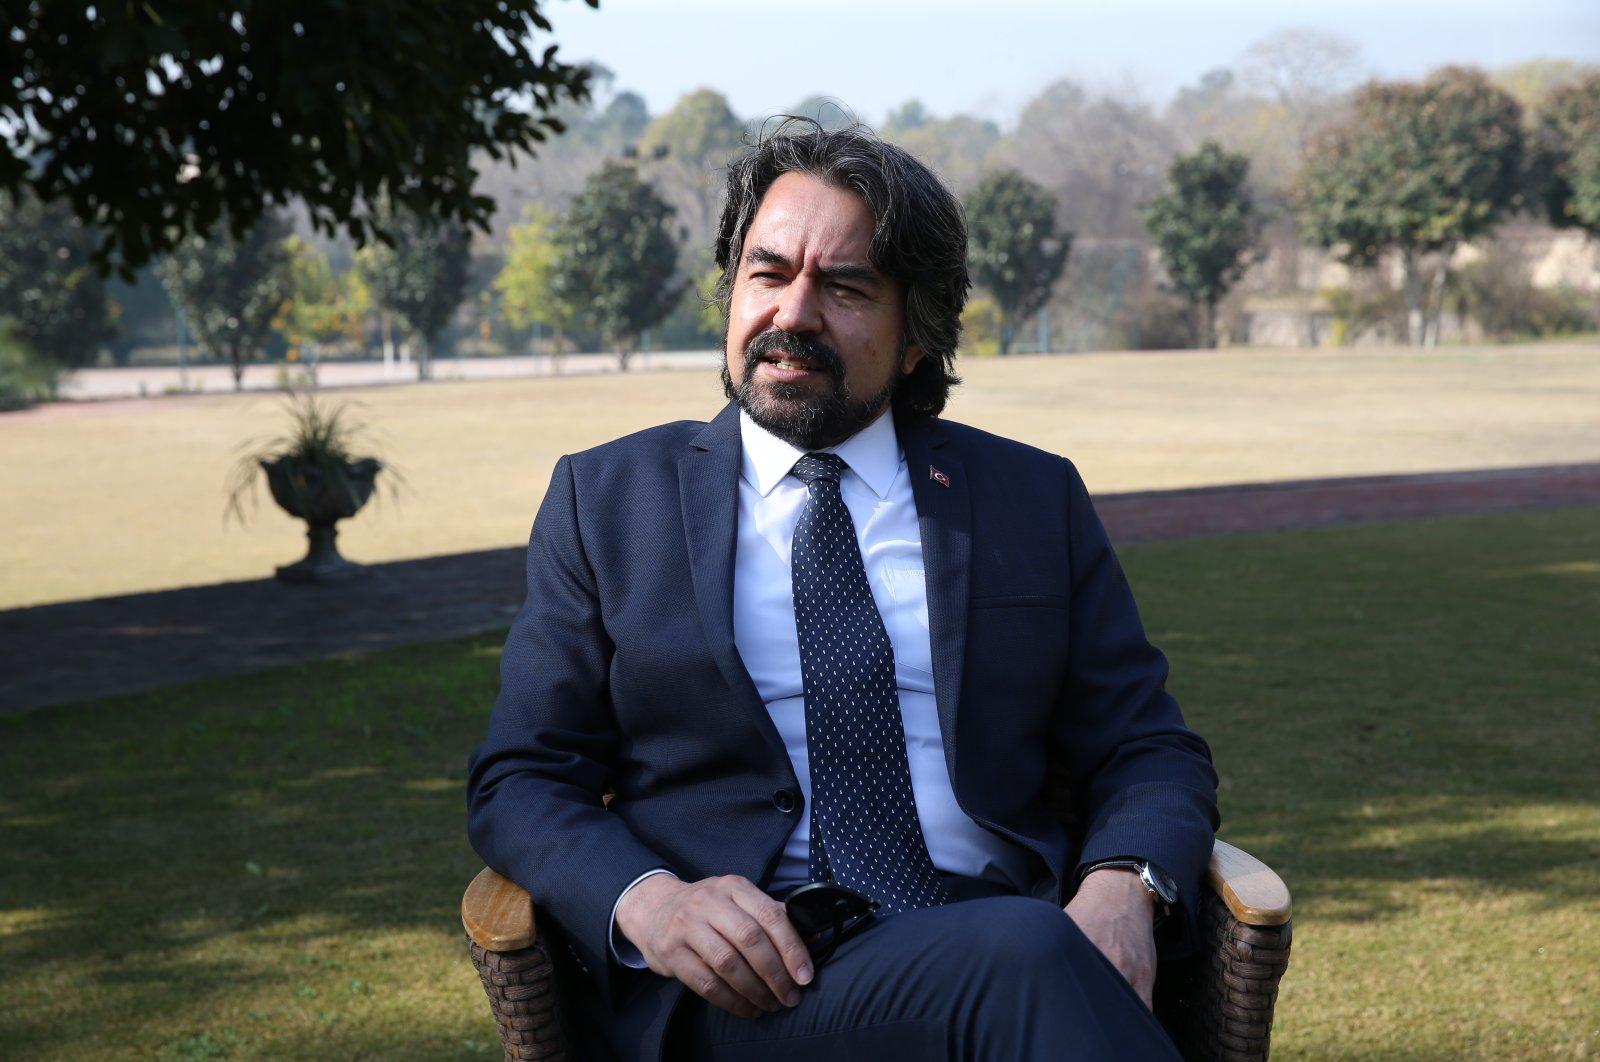 Ambassador Ihsan Mustafa Yurdakul speaks to Anadolu Agency in Islamabad, Pakistan, Jan. 12, 2020 (AA Photo)